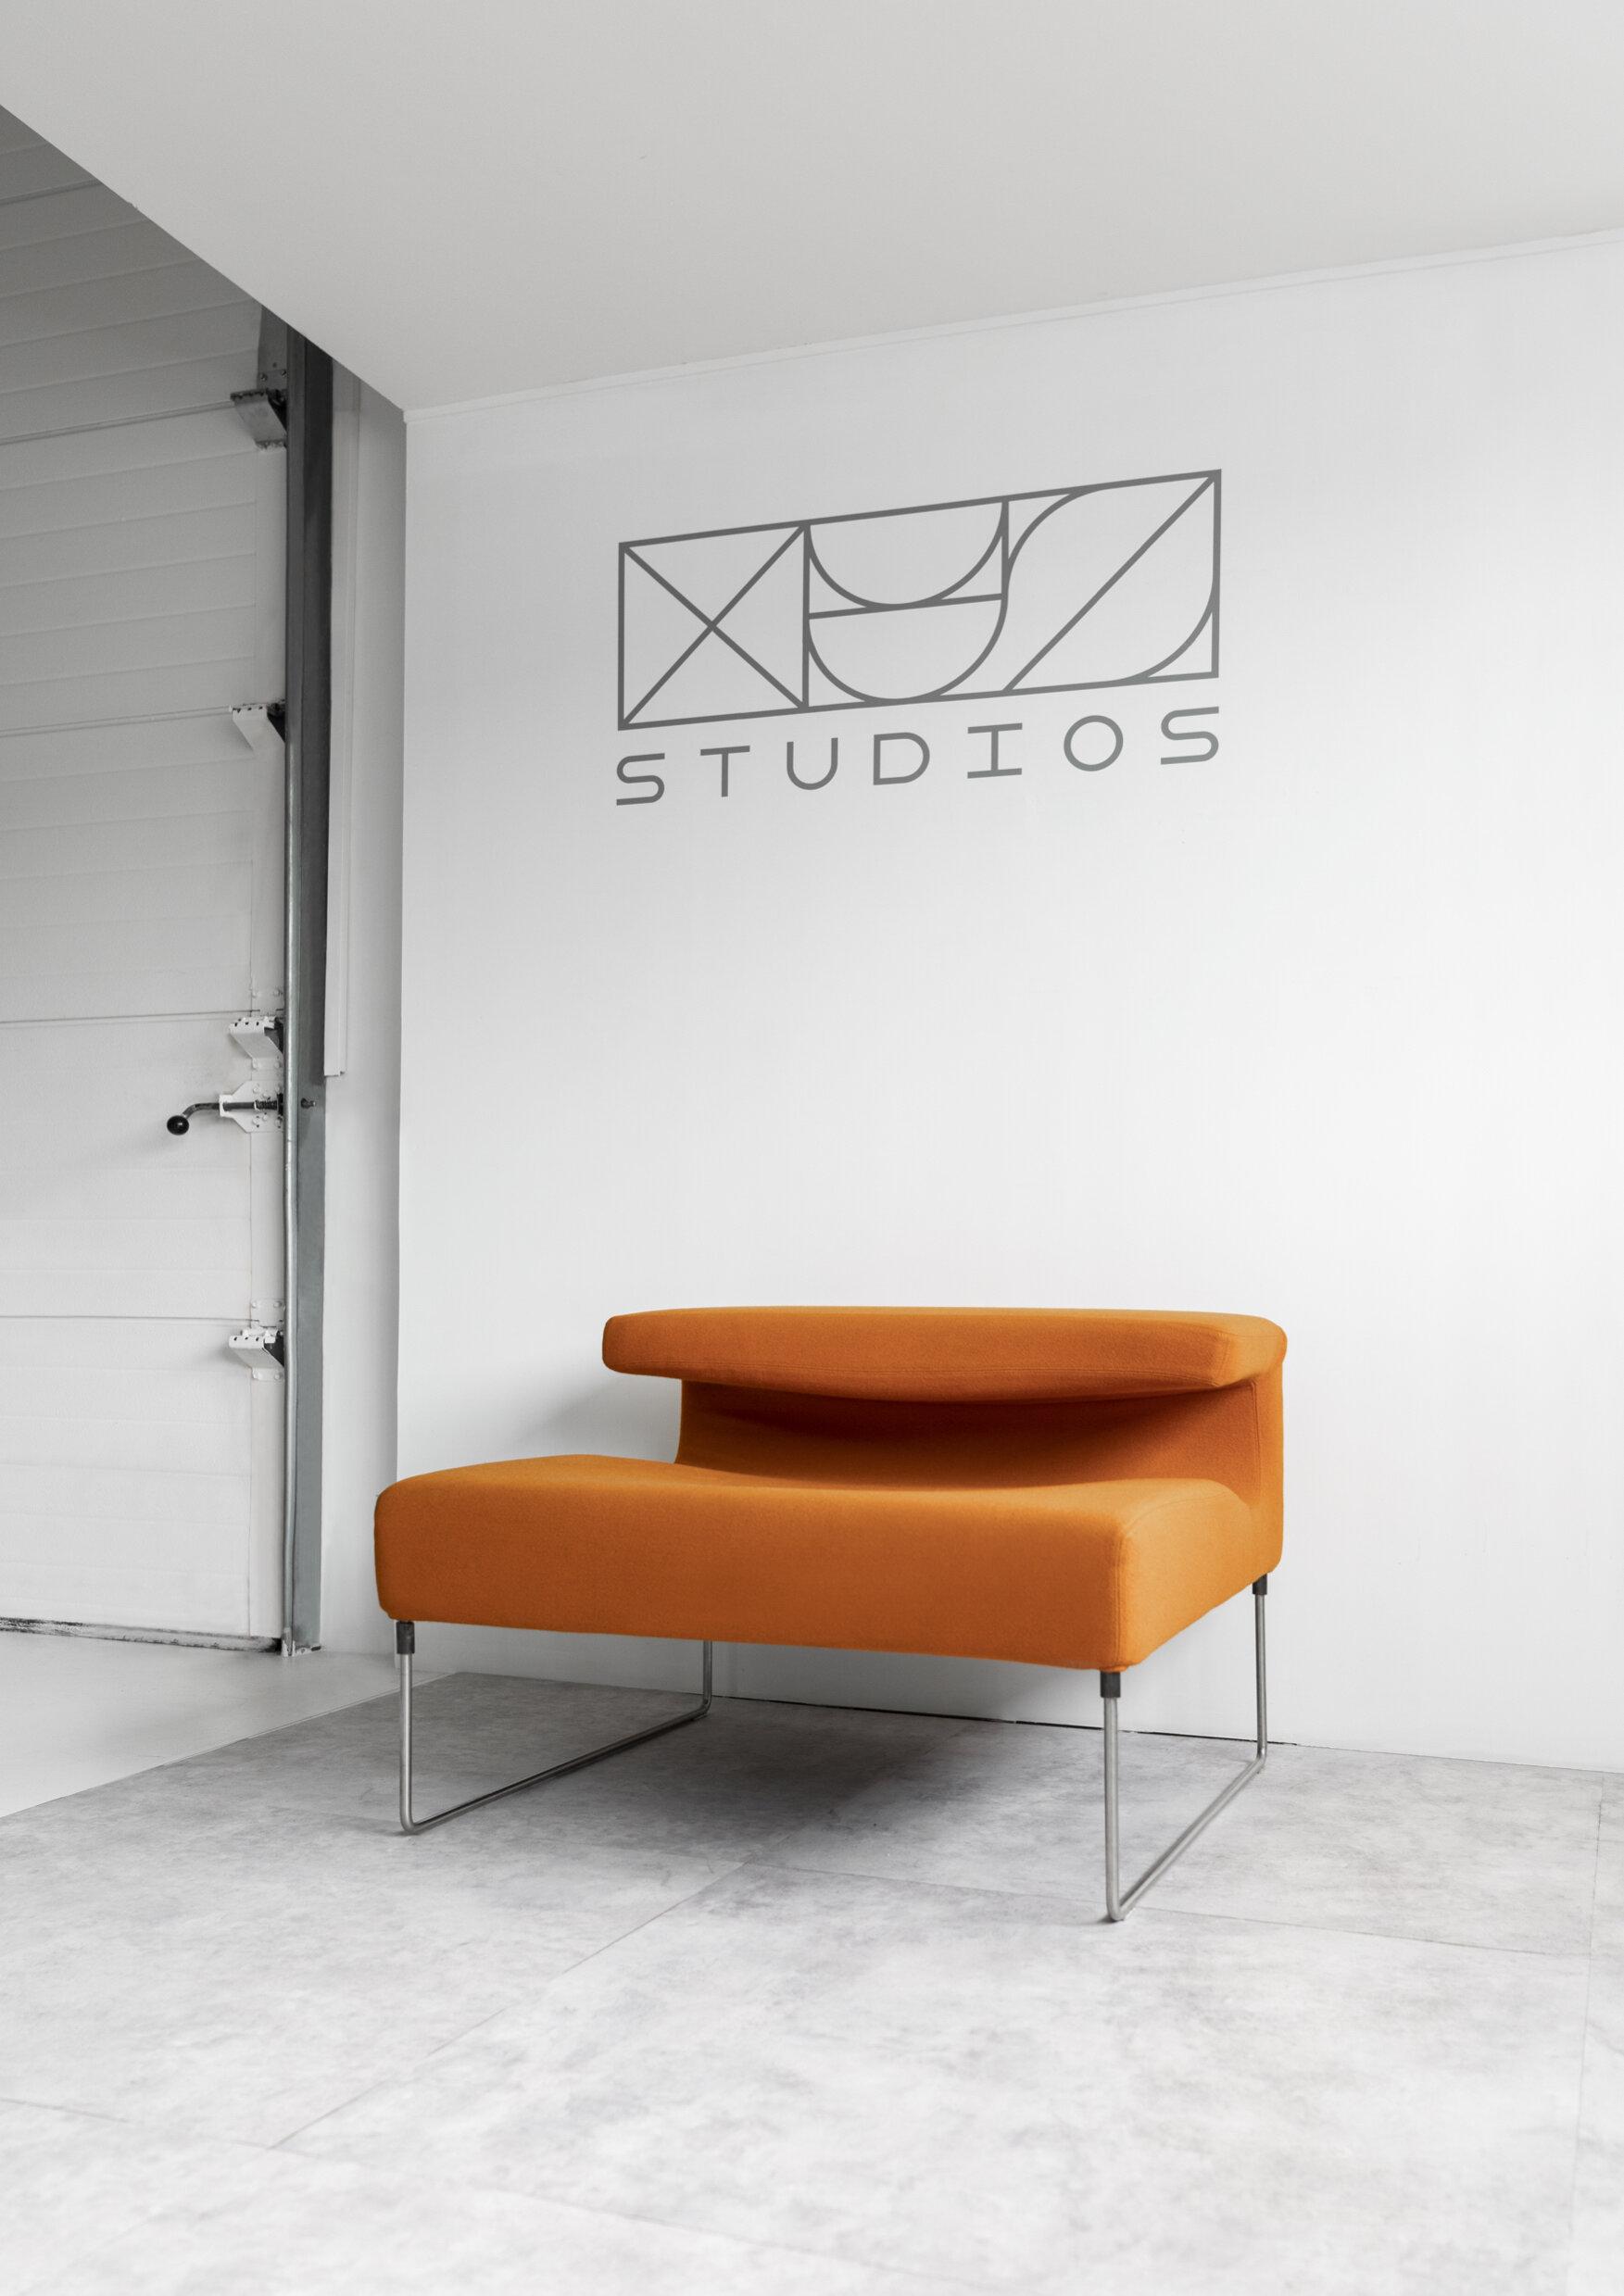 Design Bank Oranje.Fotostudio Huren Amsterdam Rent Photo Studio Amsterdam